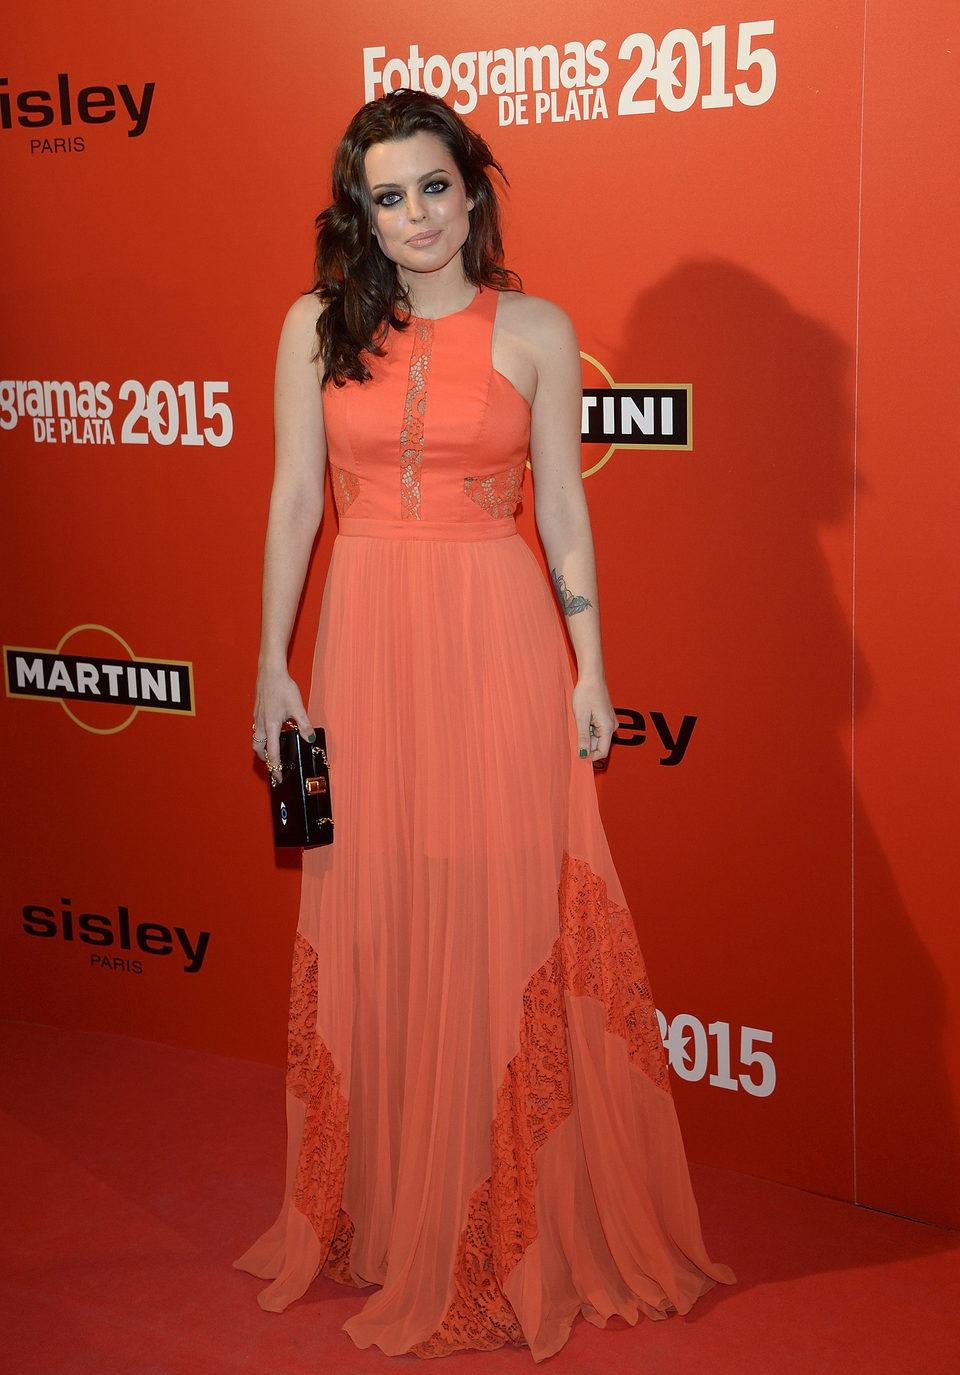 Adriana Torrebejano en la alfombra roja de los Fotogramas de Plata 2015